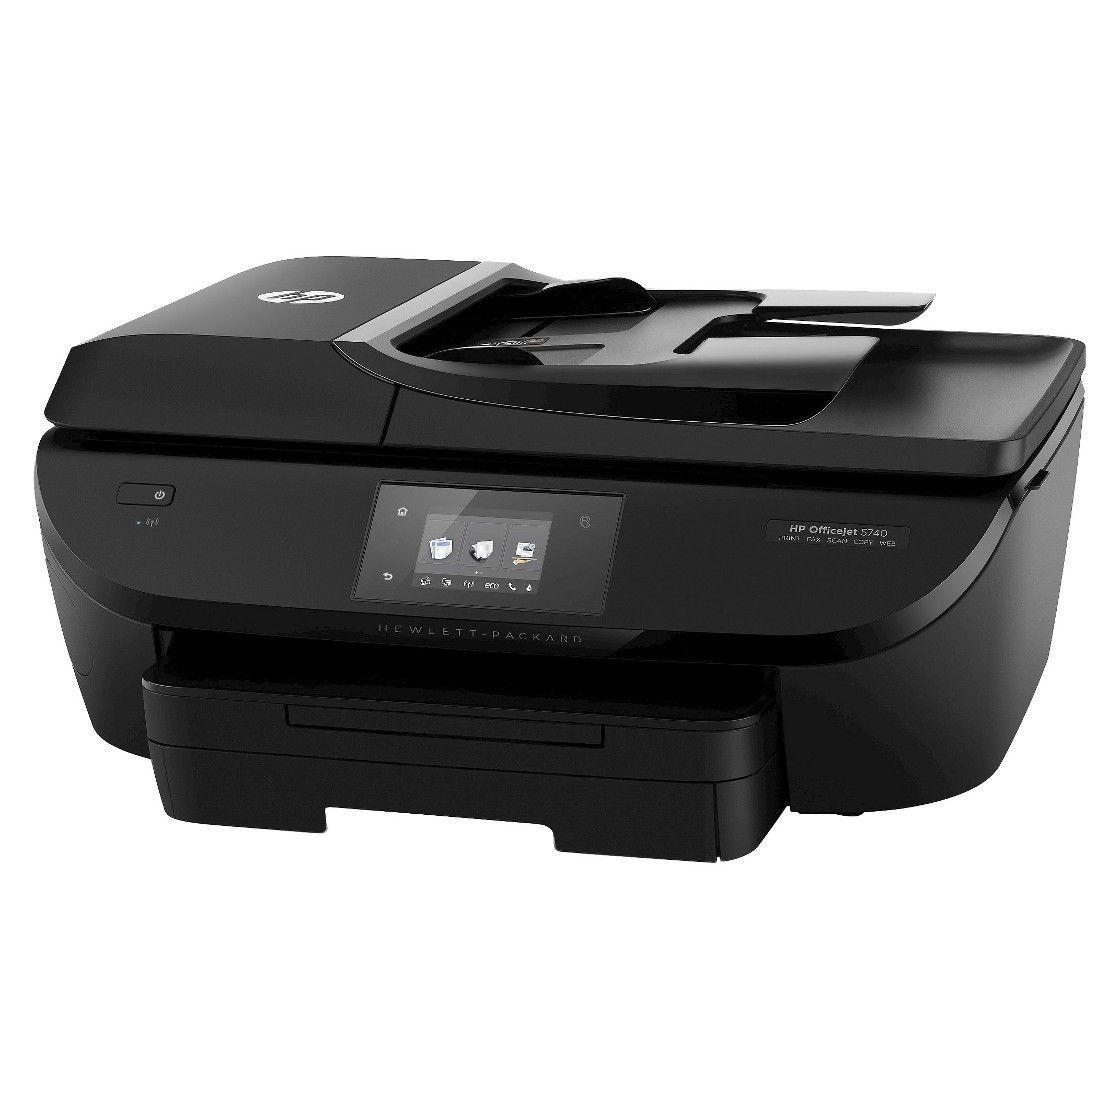 Hp Oj 5740 Color Multifunction Inkjet Printer Black B9s76a Hp Officejet Printer Mobile Print